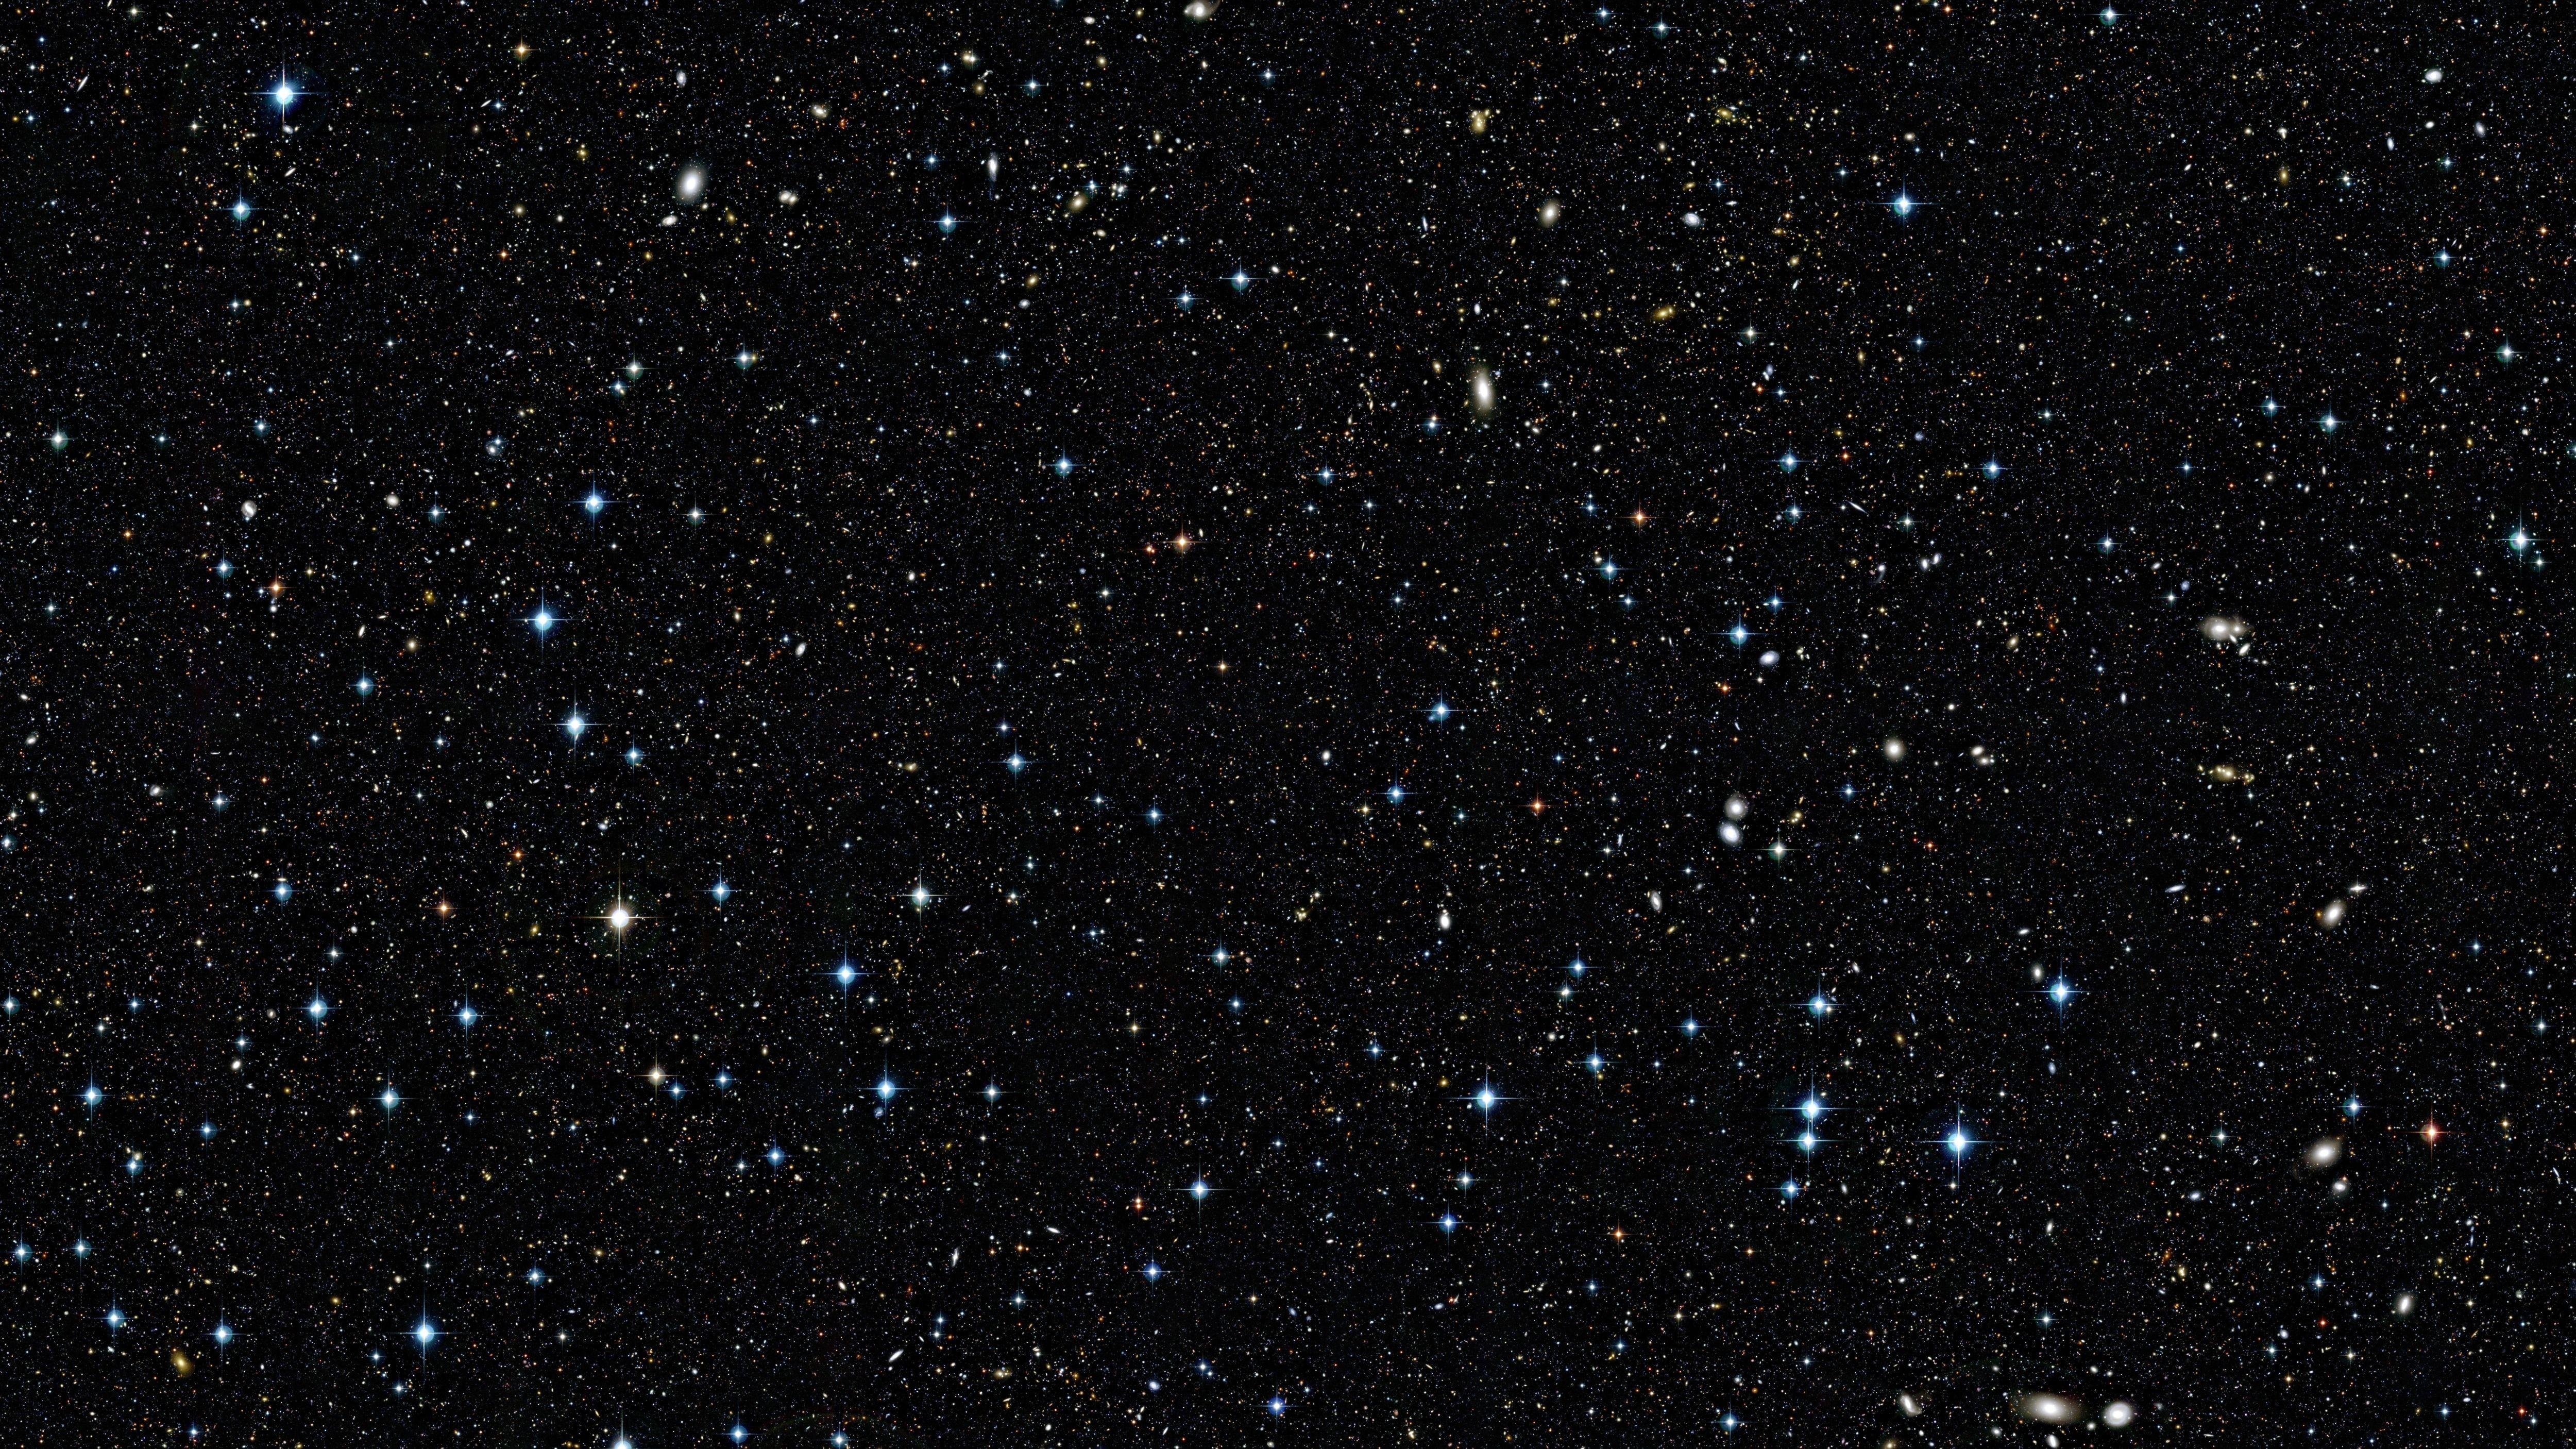 General 5000x2812 space stars space art digital art